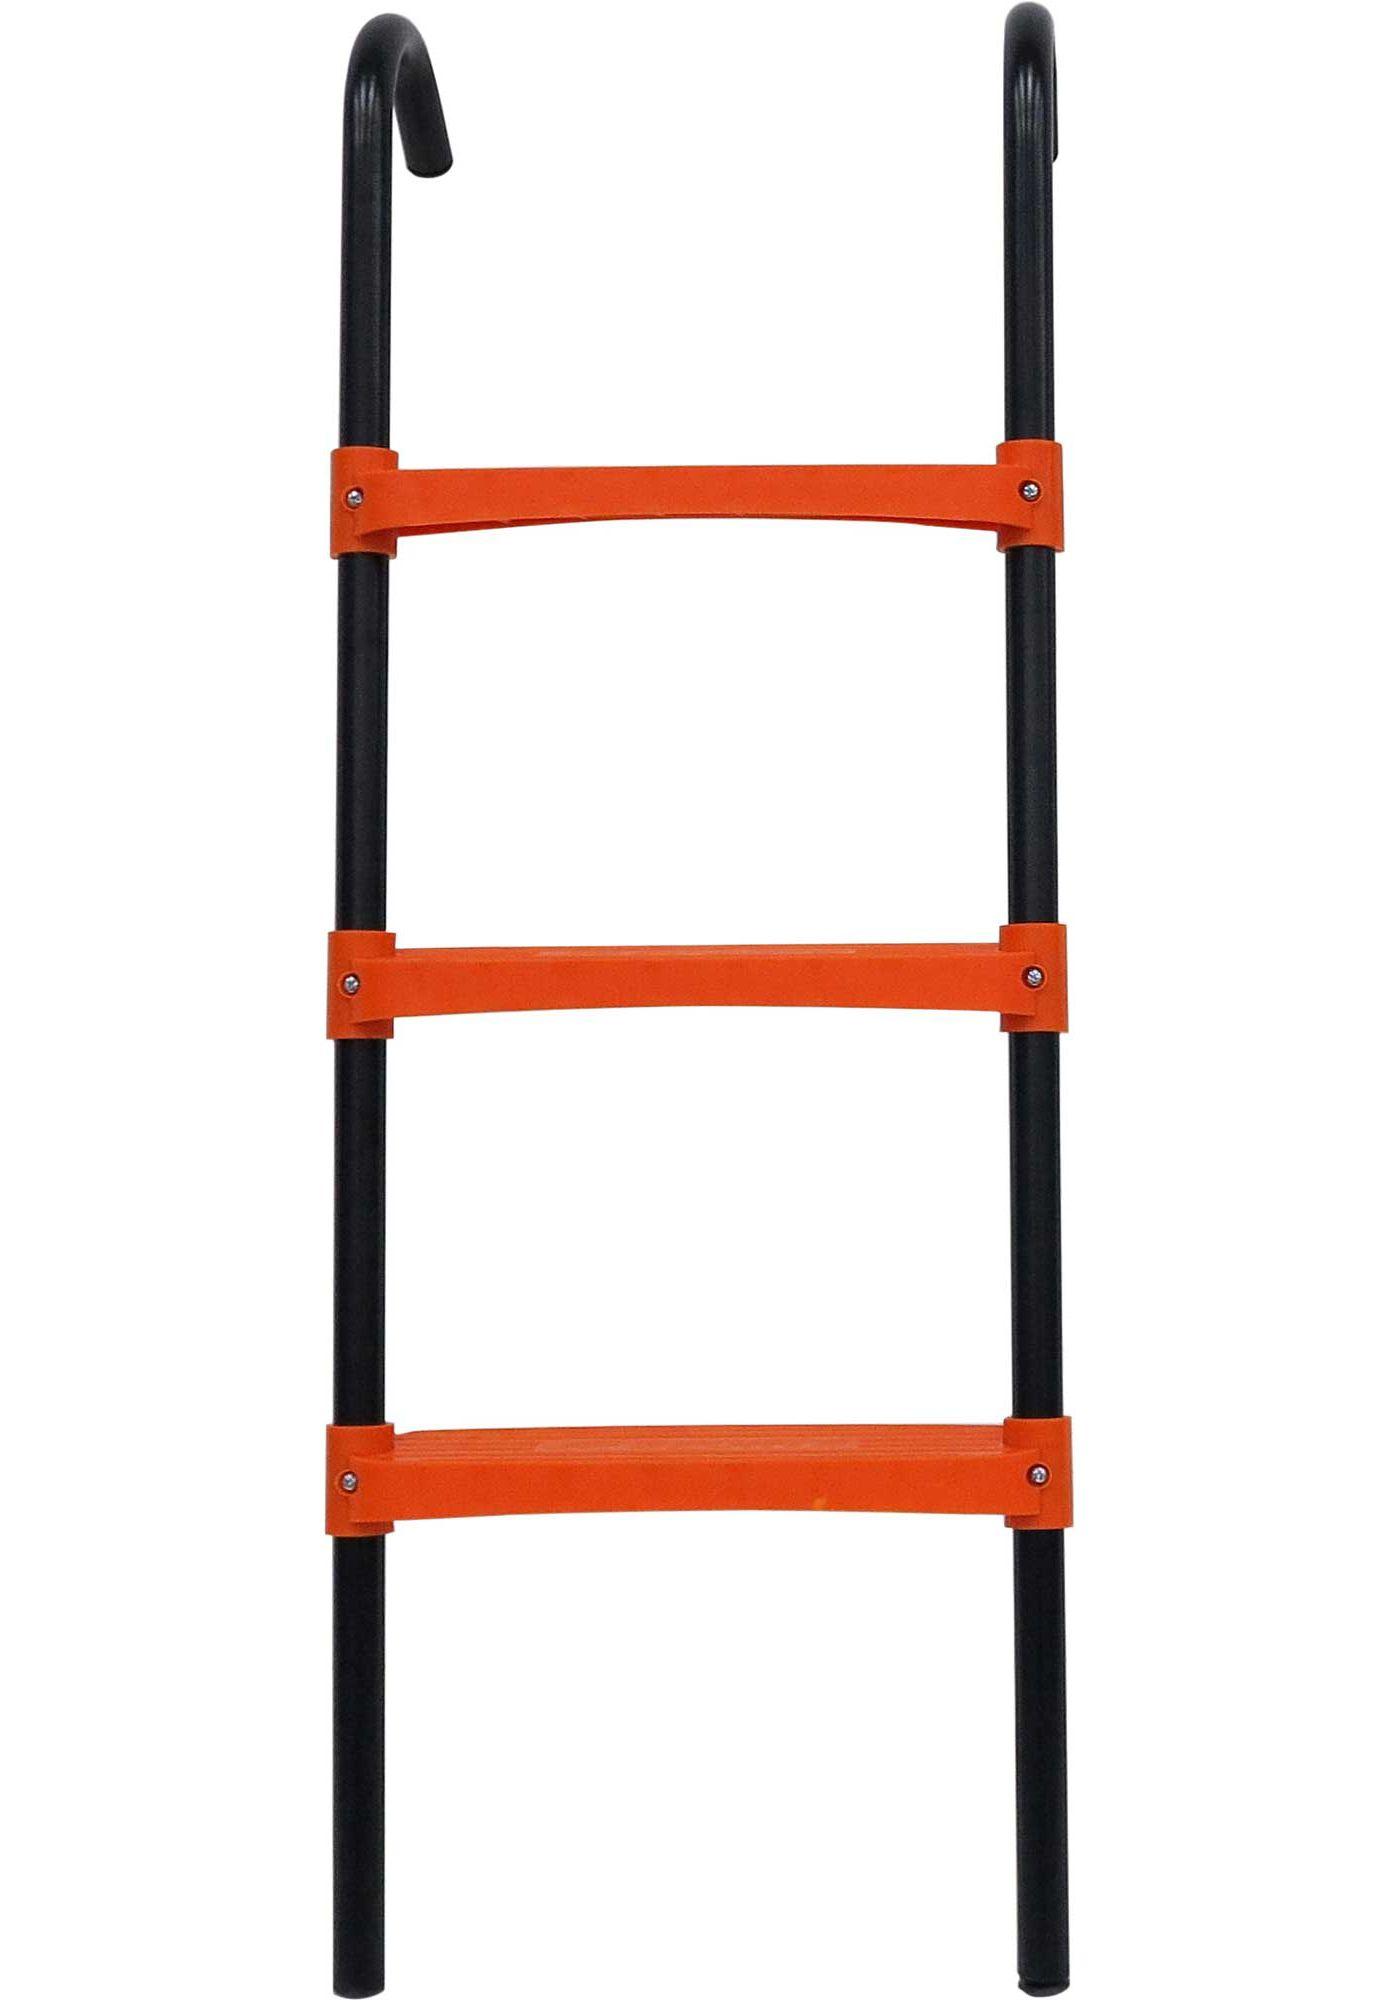 Jump Power Trampoline Step-Up Ladder